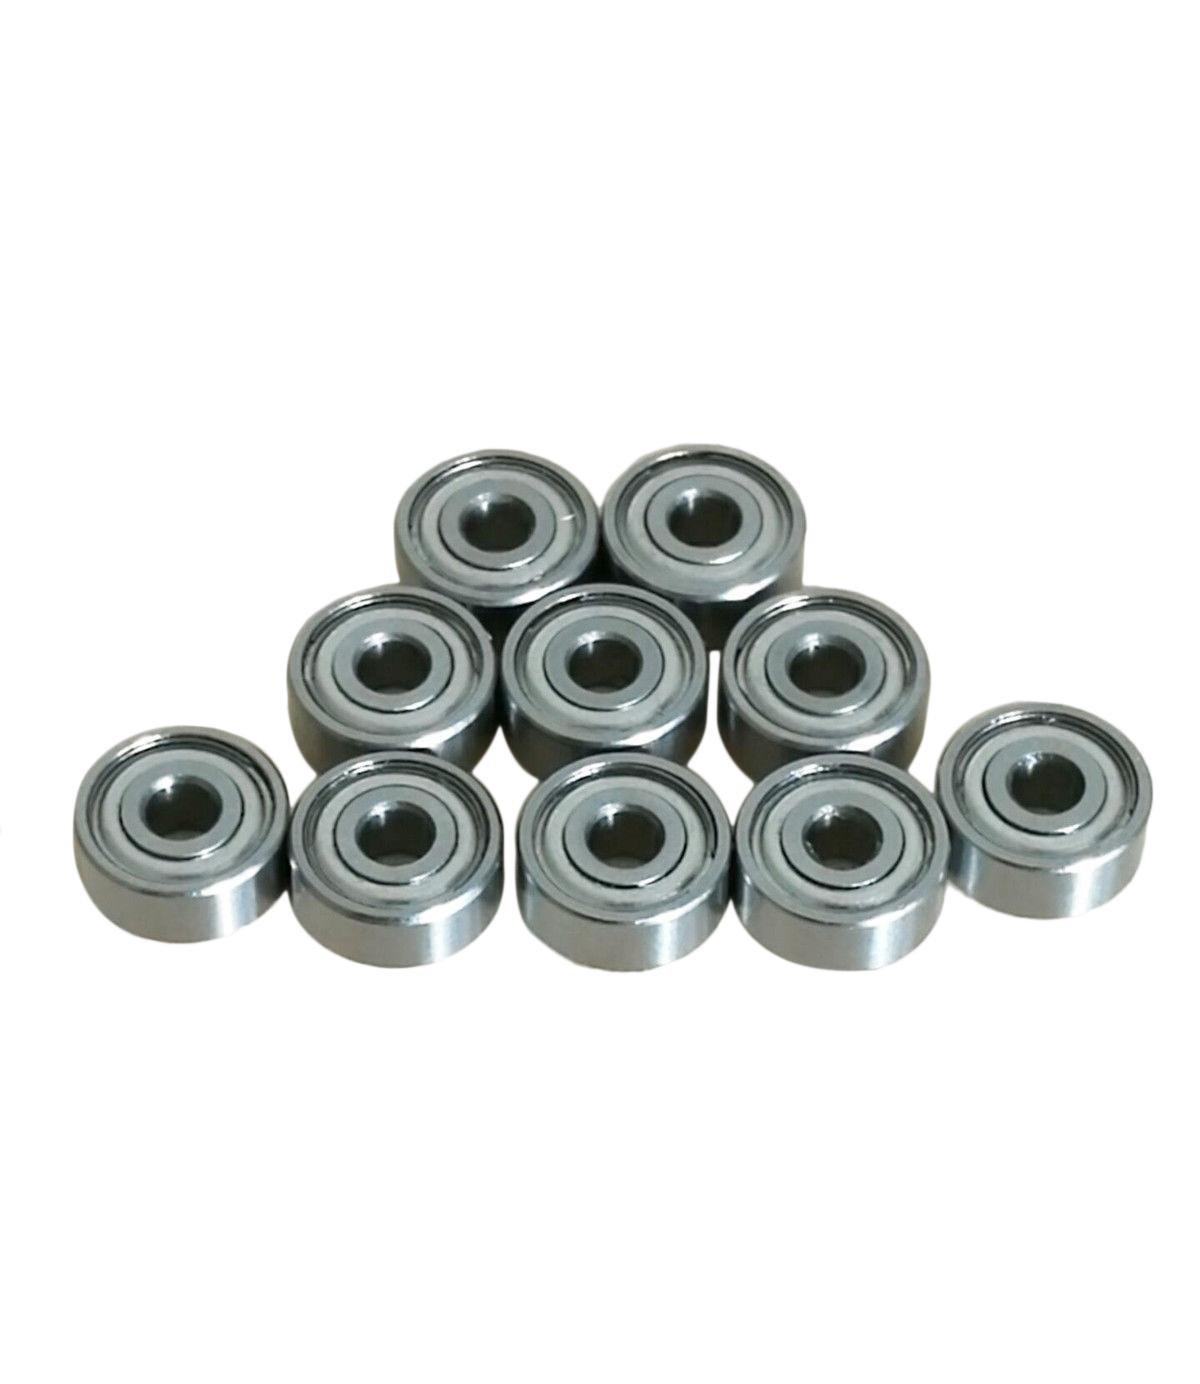 10pcs R2ZZ R2 1//8 x 3//8 x 5//32 Metal Shielded Ball Bearings